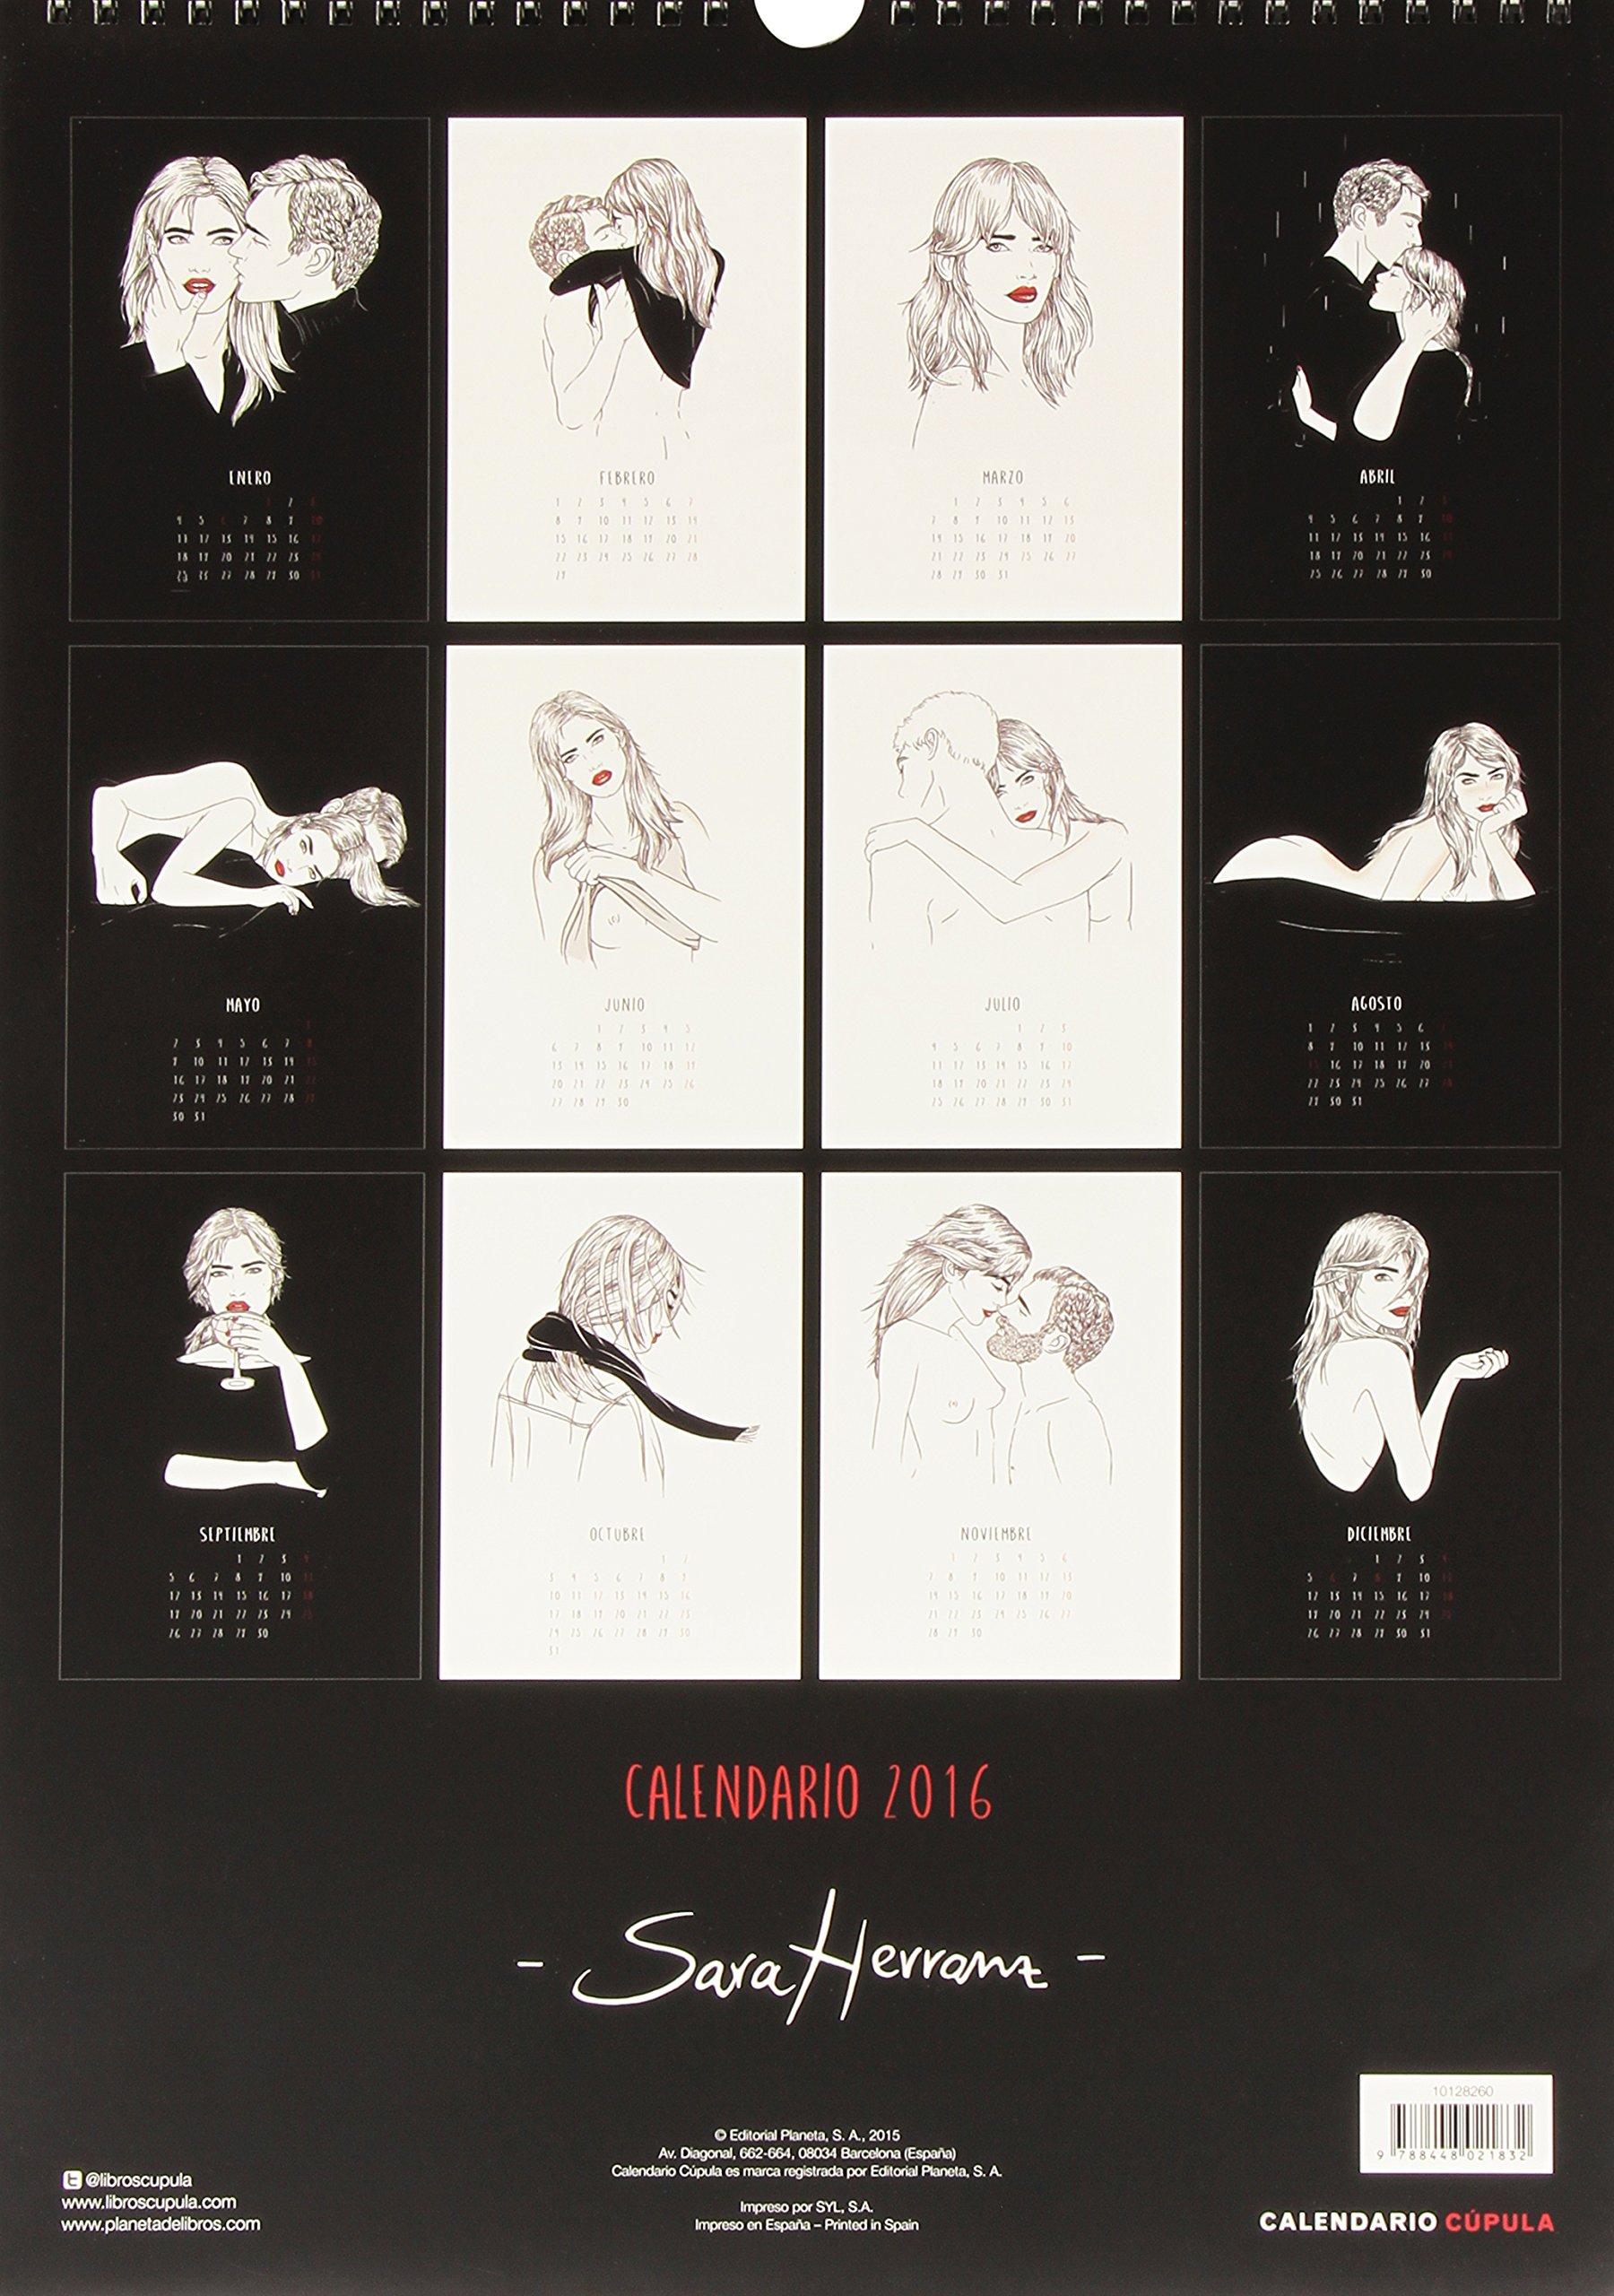 Calendario. Un año perfecto (Calendarios y agendas): Amazon ...